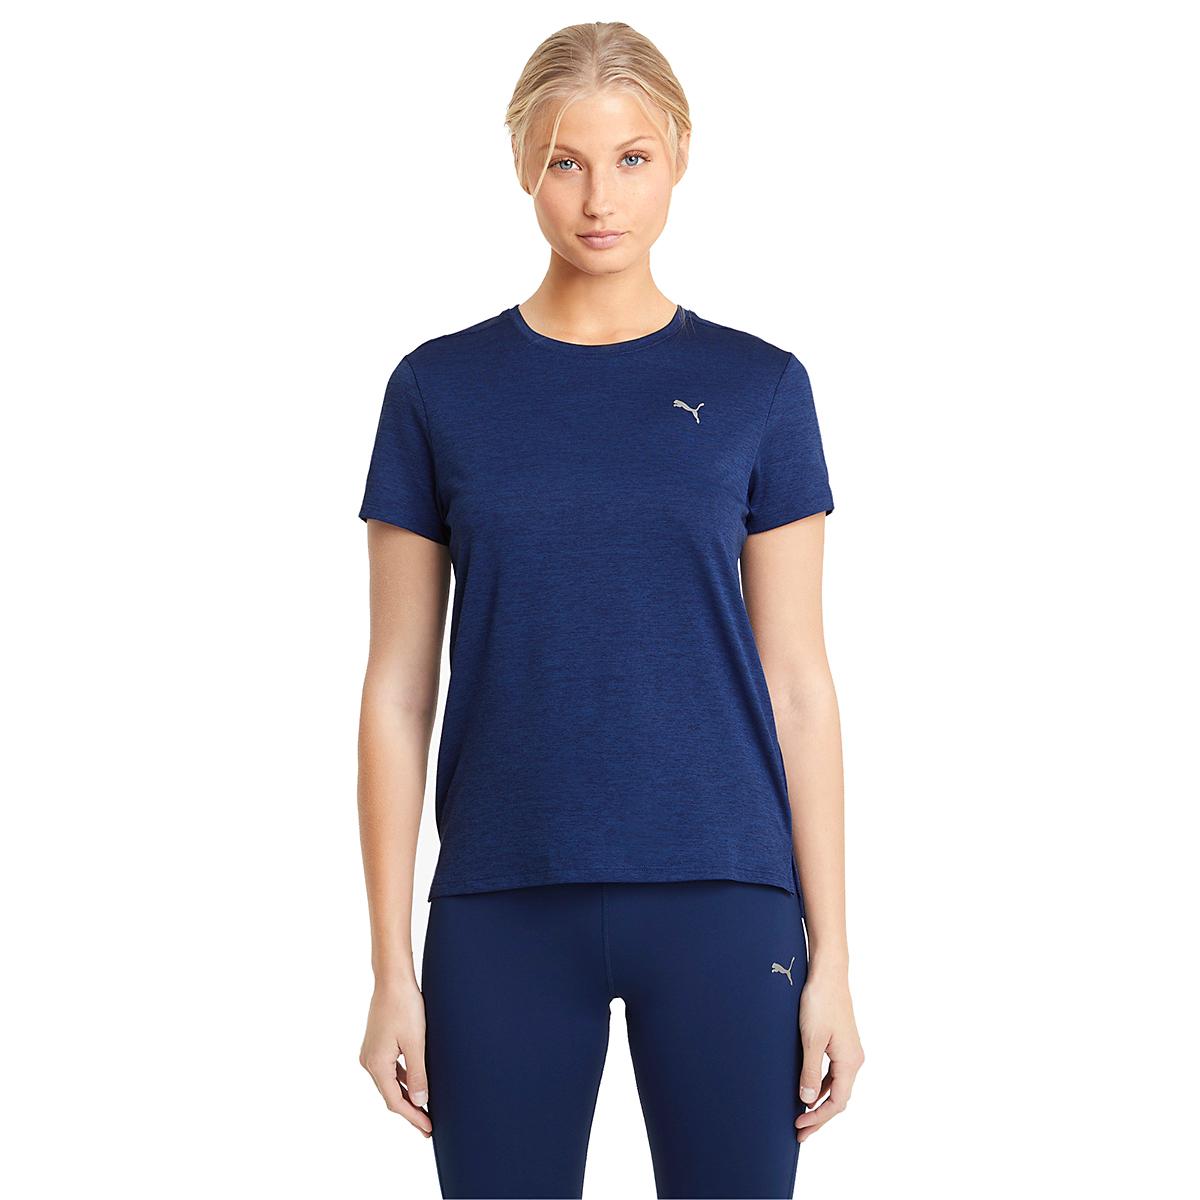 Women's Puma Favorite Heather Short Sleeve Running Tee - Color: Elektro Blue Heather - Size: XS, Elektro Blue Heather, large, image 1